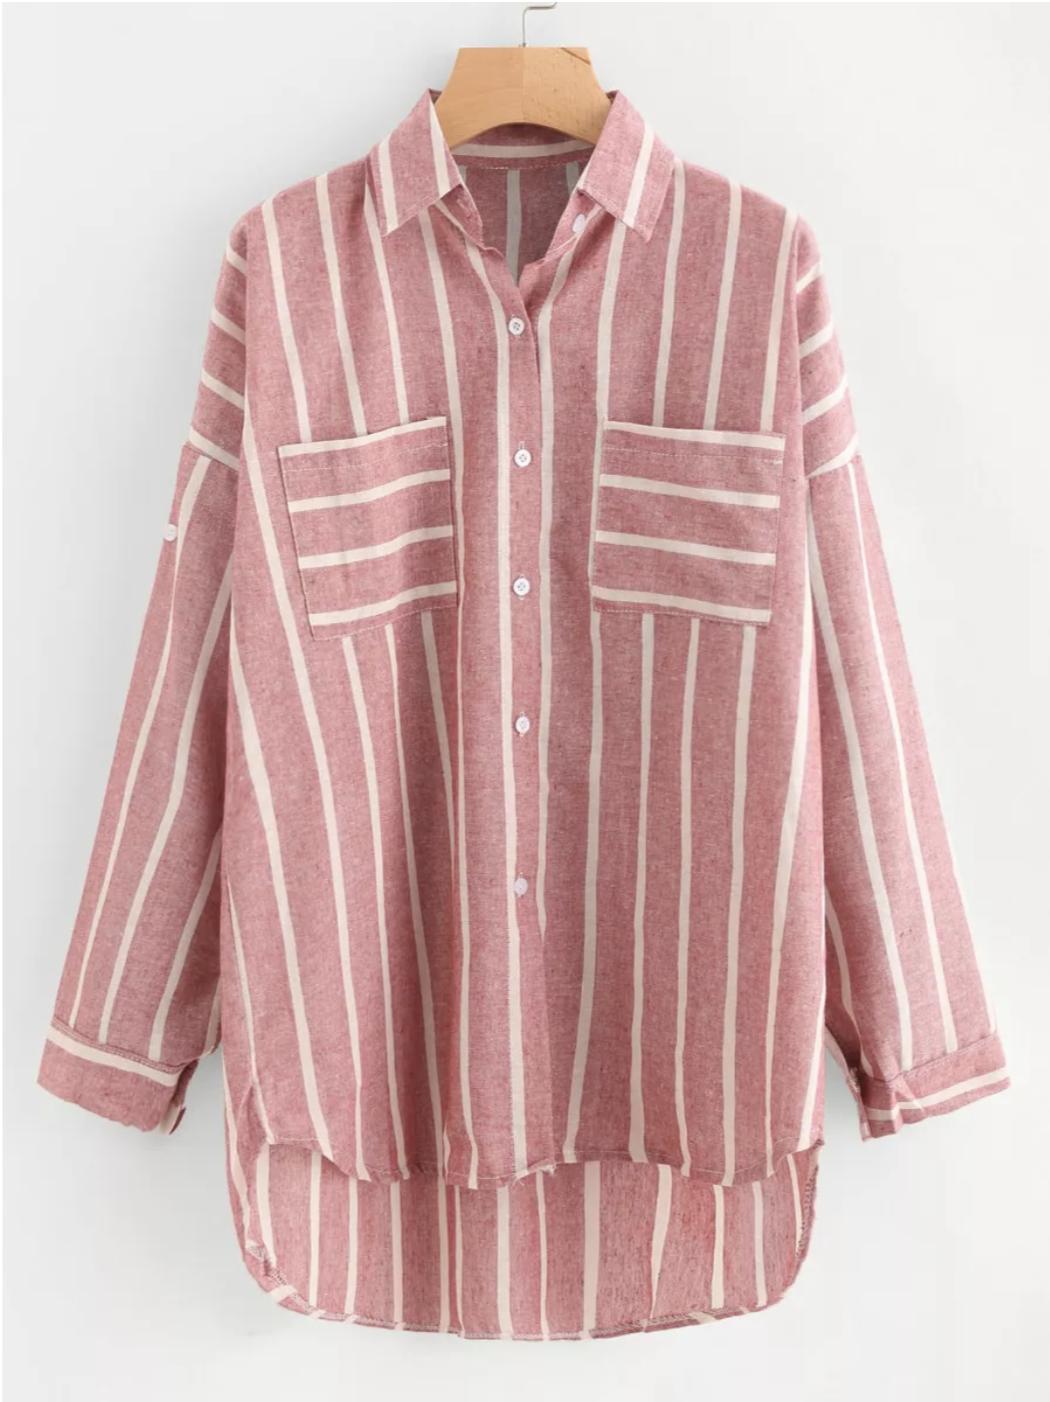 Polo shirt, everyday look, OOTD Magazine, Basic